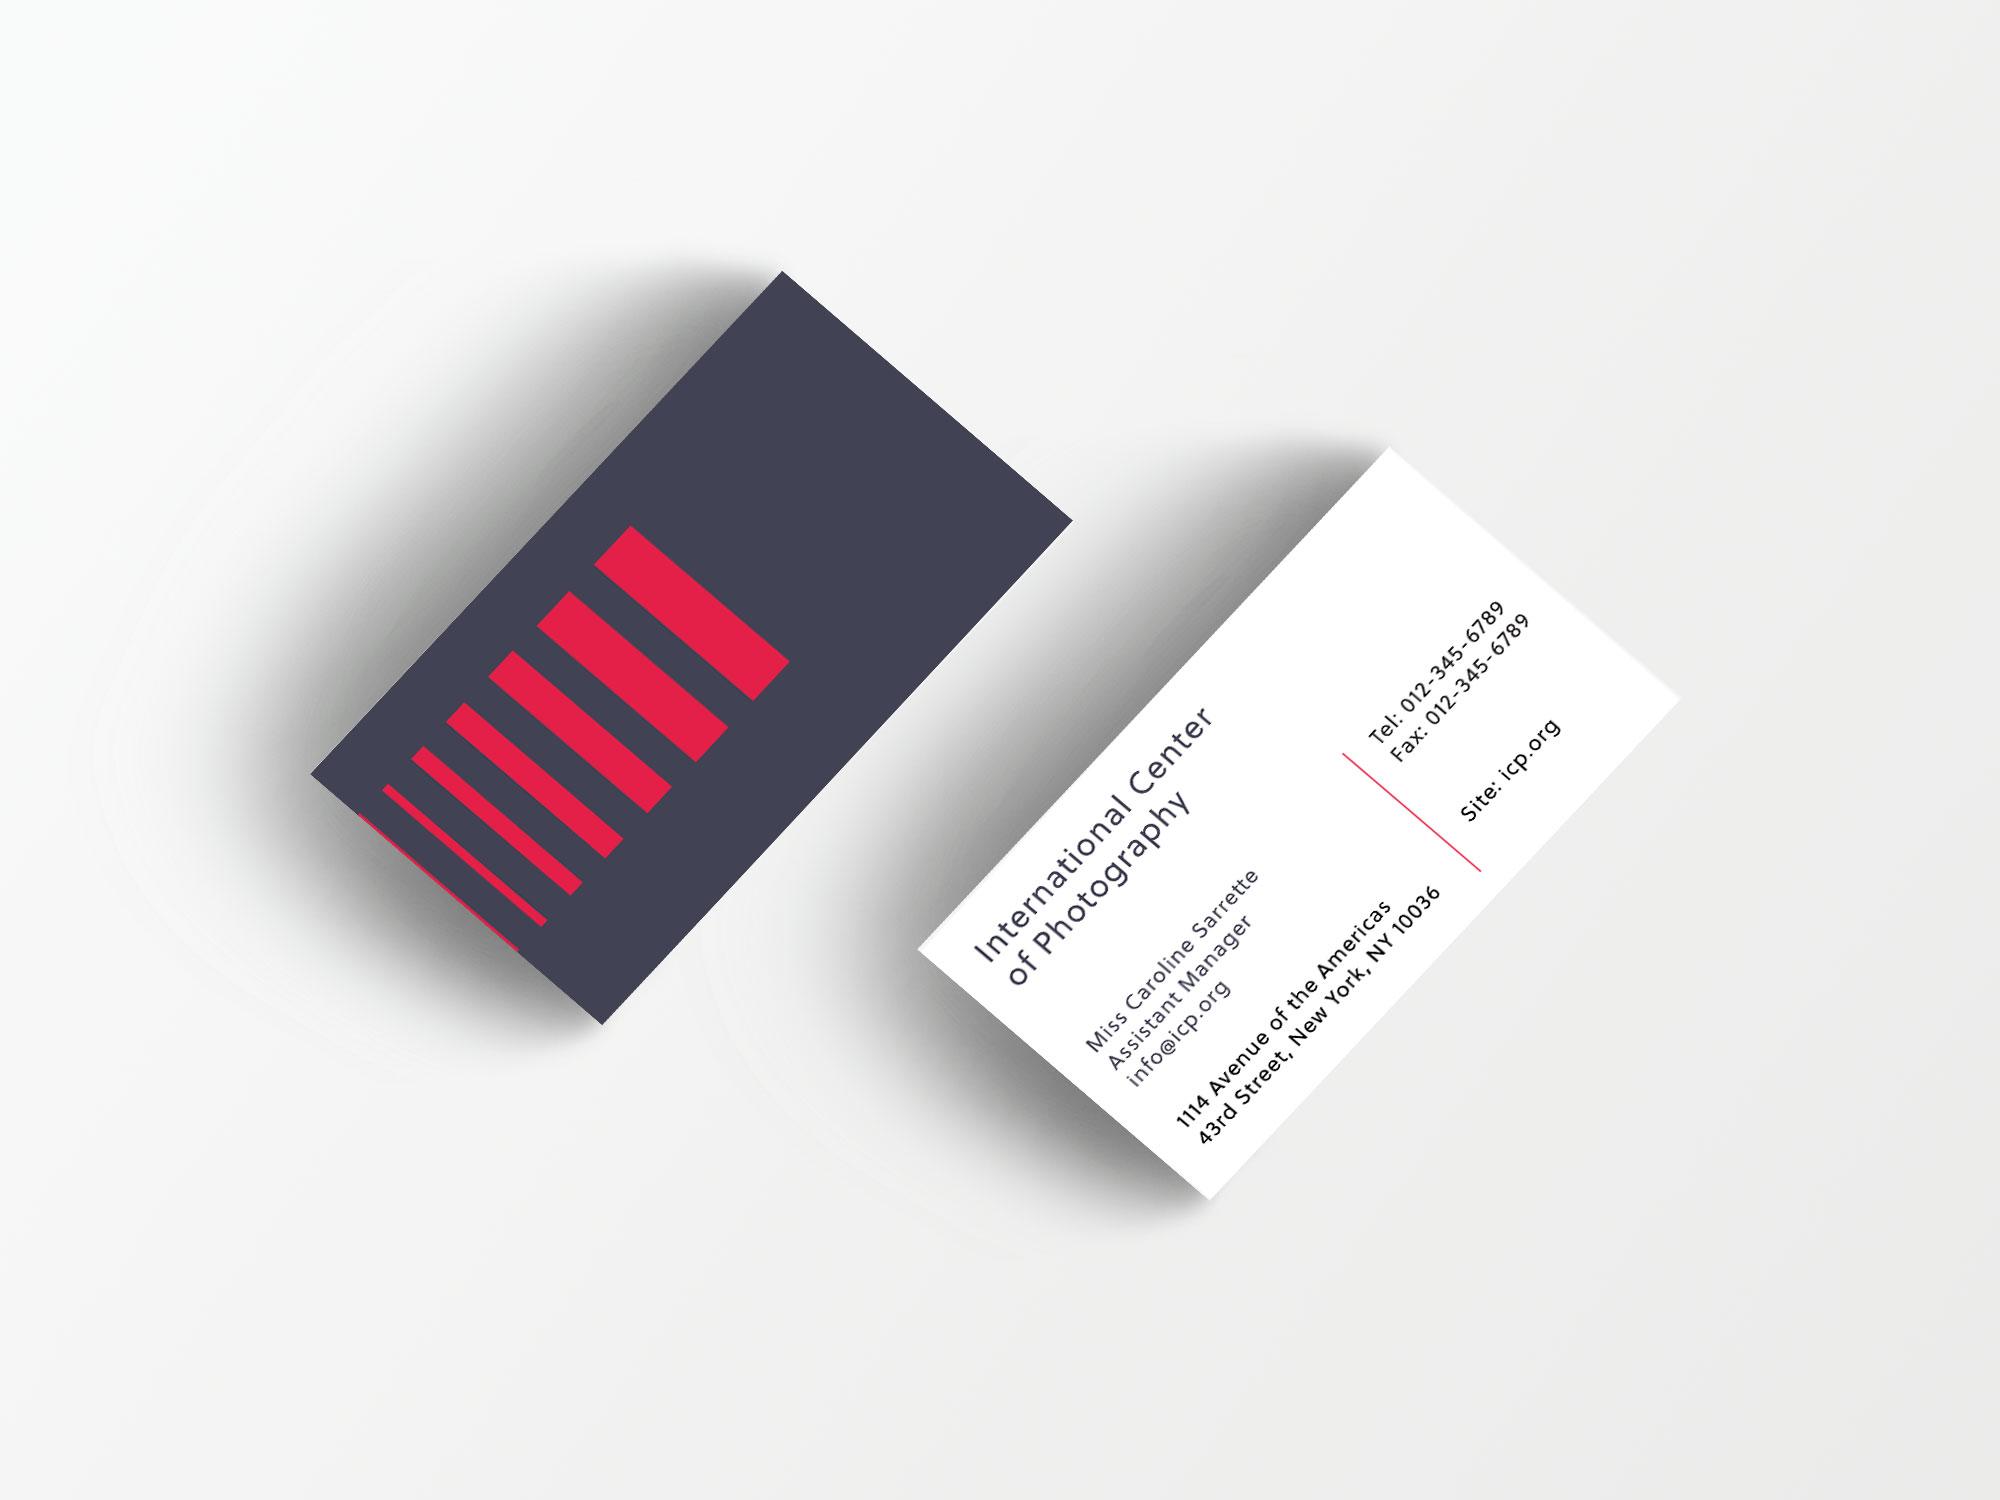 Business-Card-Mockup-15-2000x1500.jpg